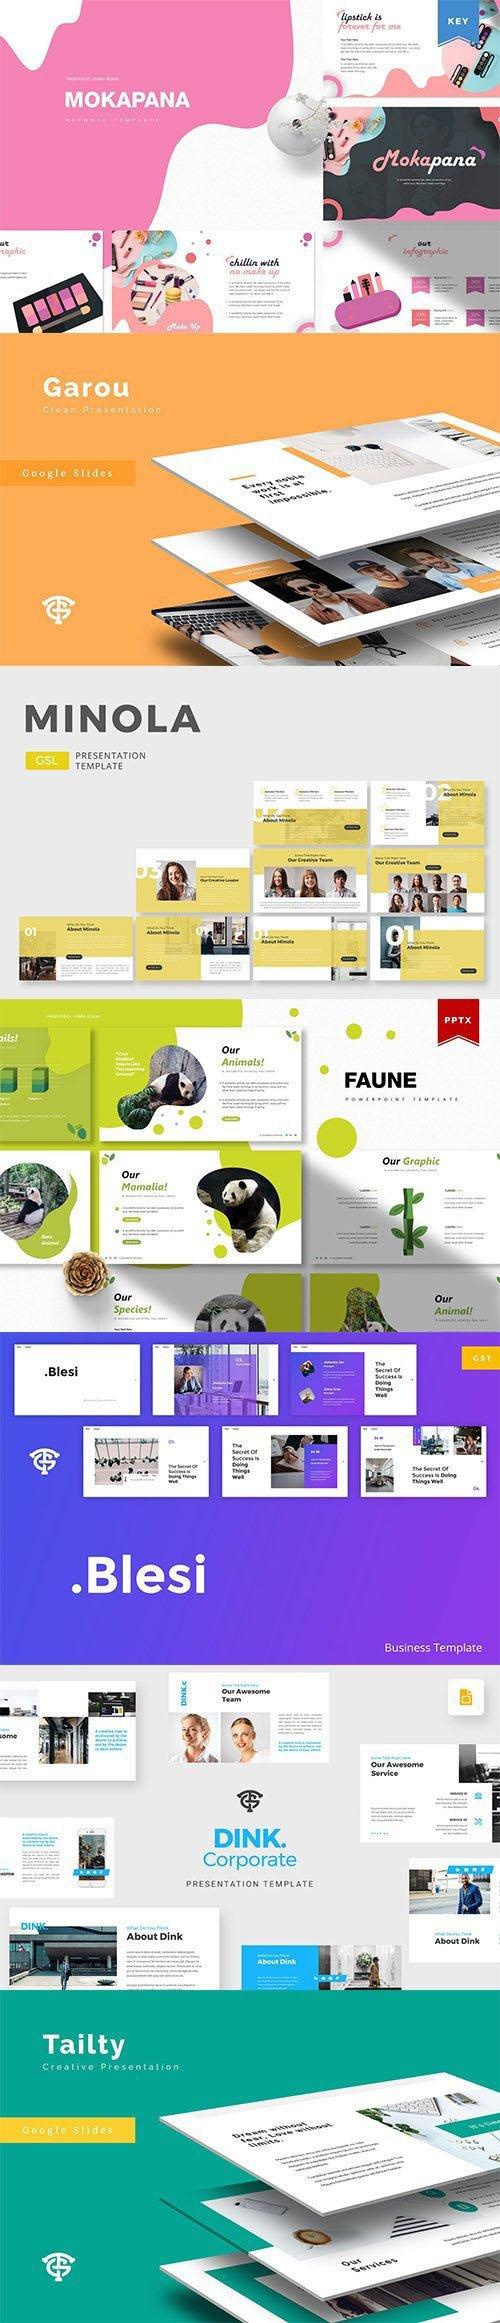 Powerpoint, Keynote and Google Slides Templates Bundle 2